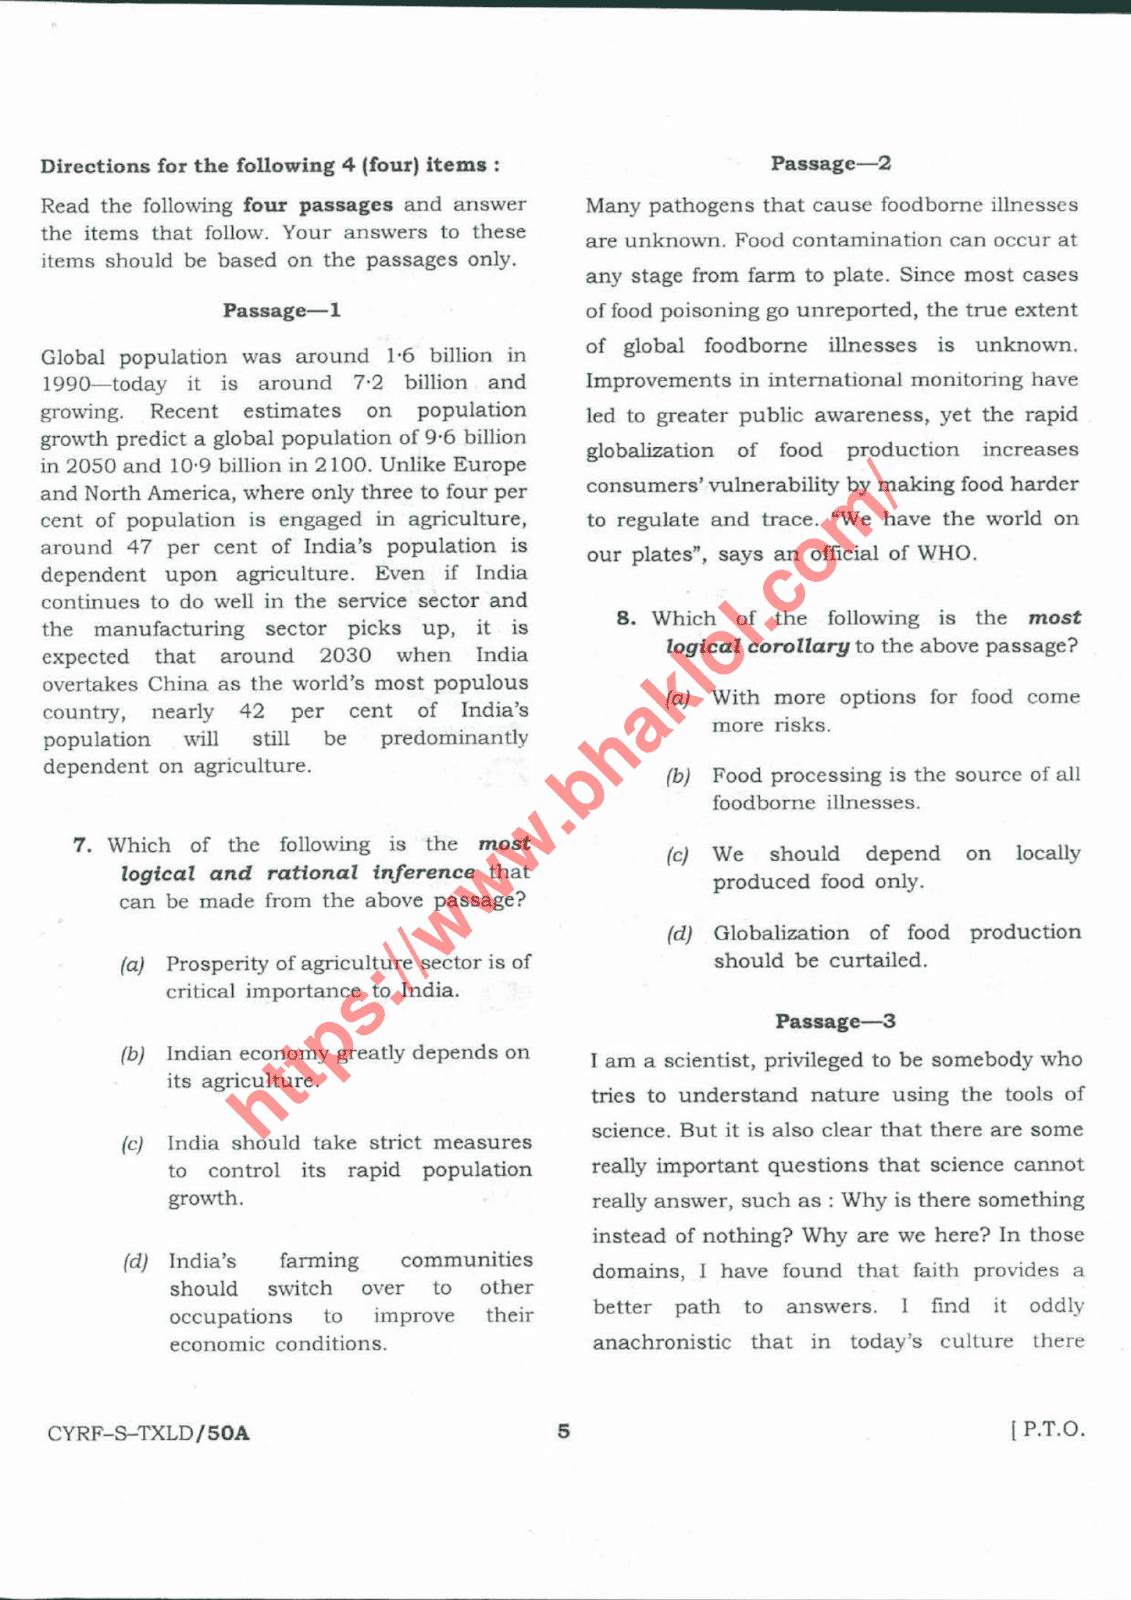 UPSC CSE(IAS) Prelims 2018 Question Paper with Answer Key